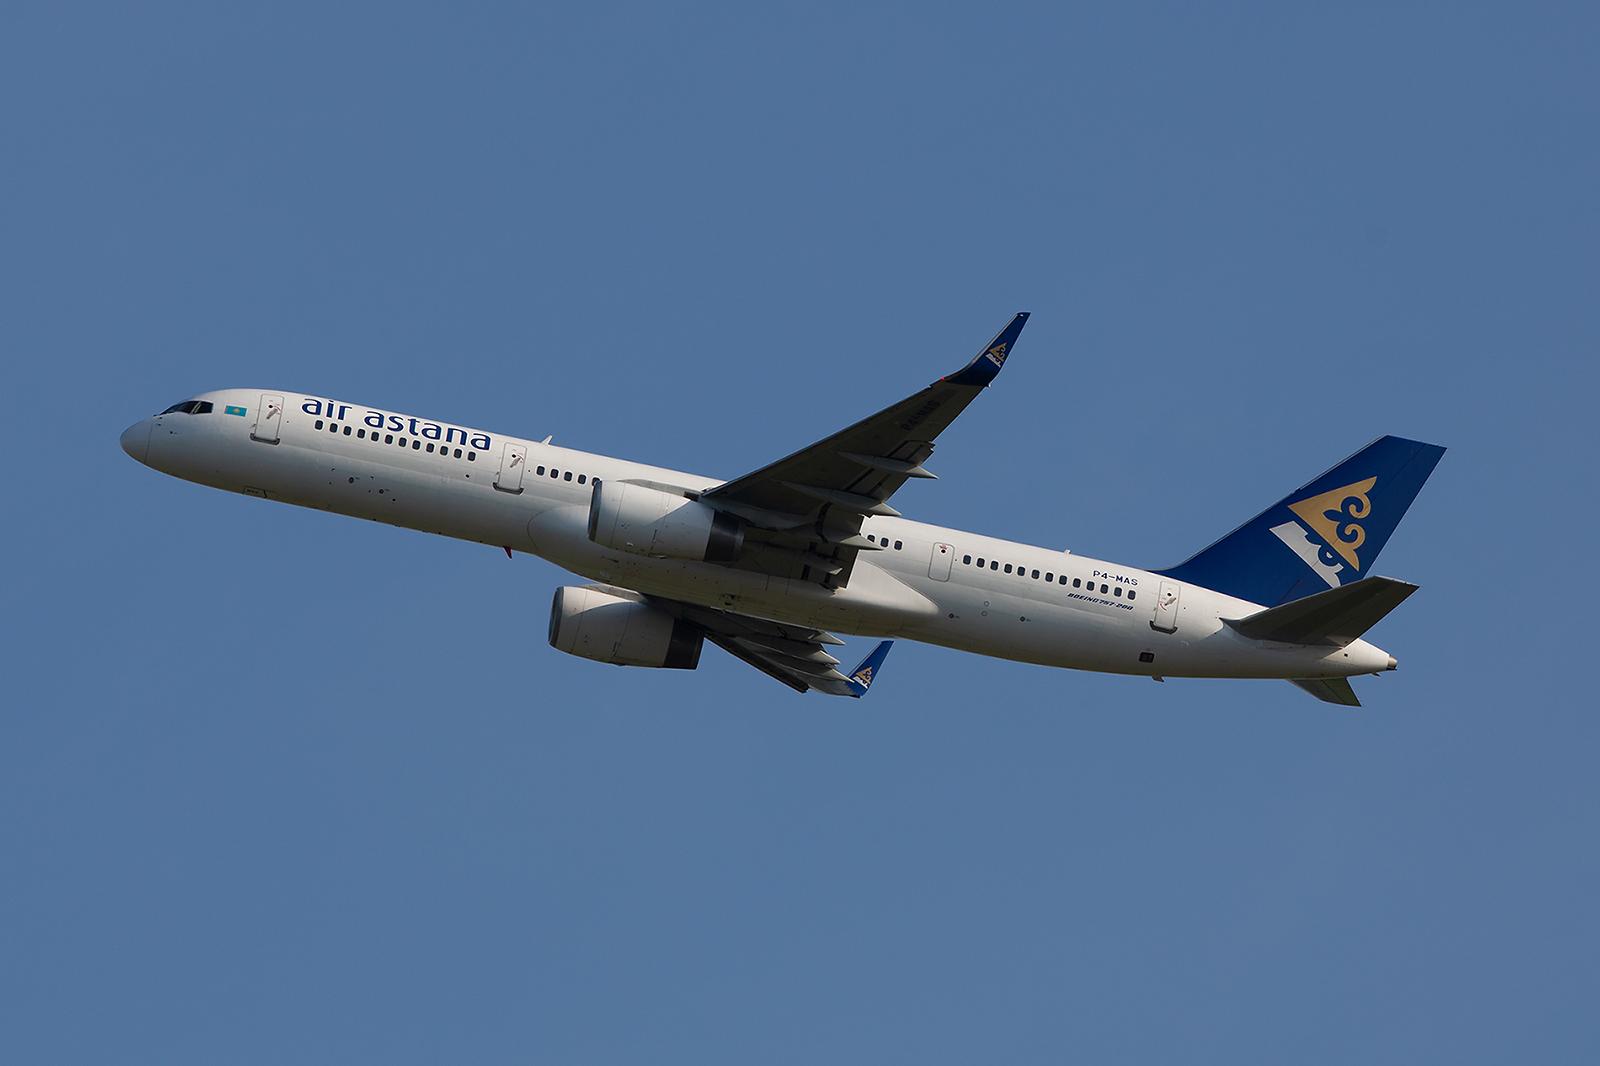 Boeing 757-200 der Ais Astana aus Kasachstan.